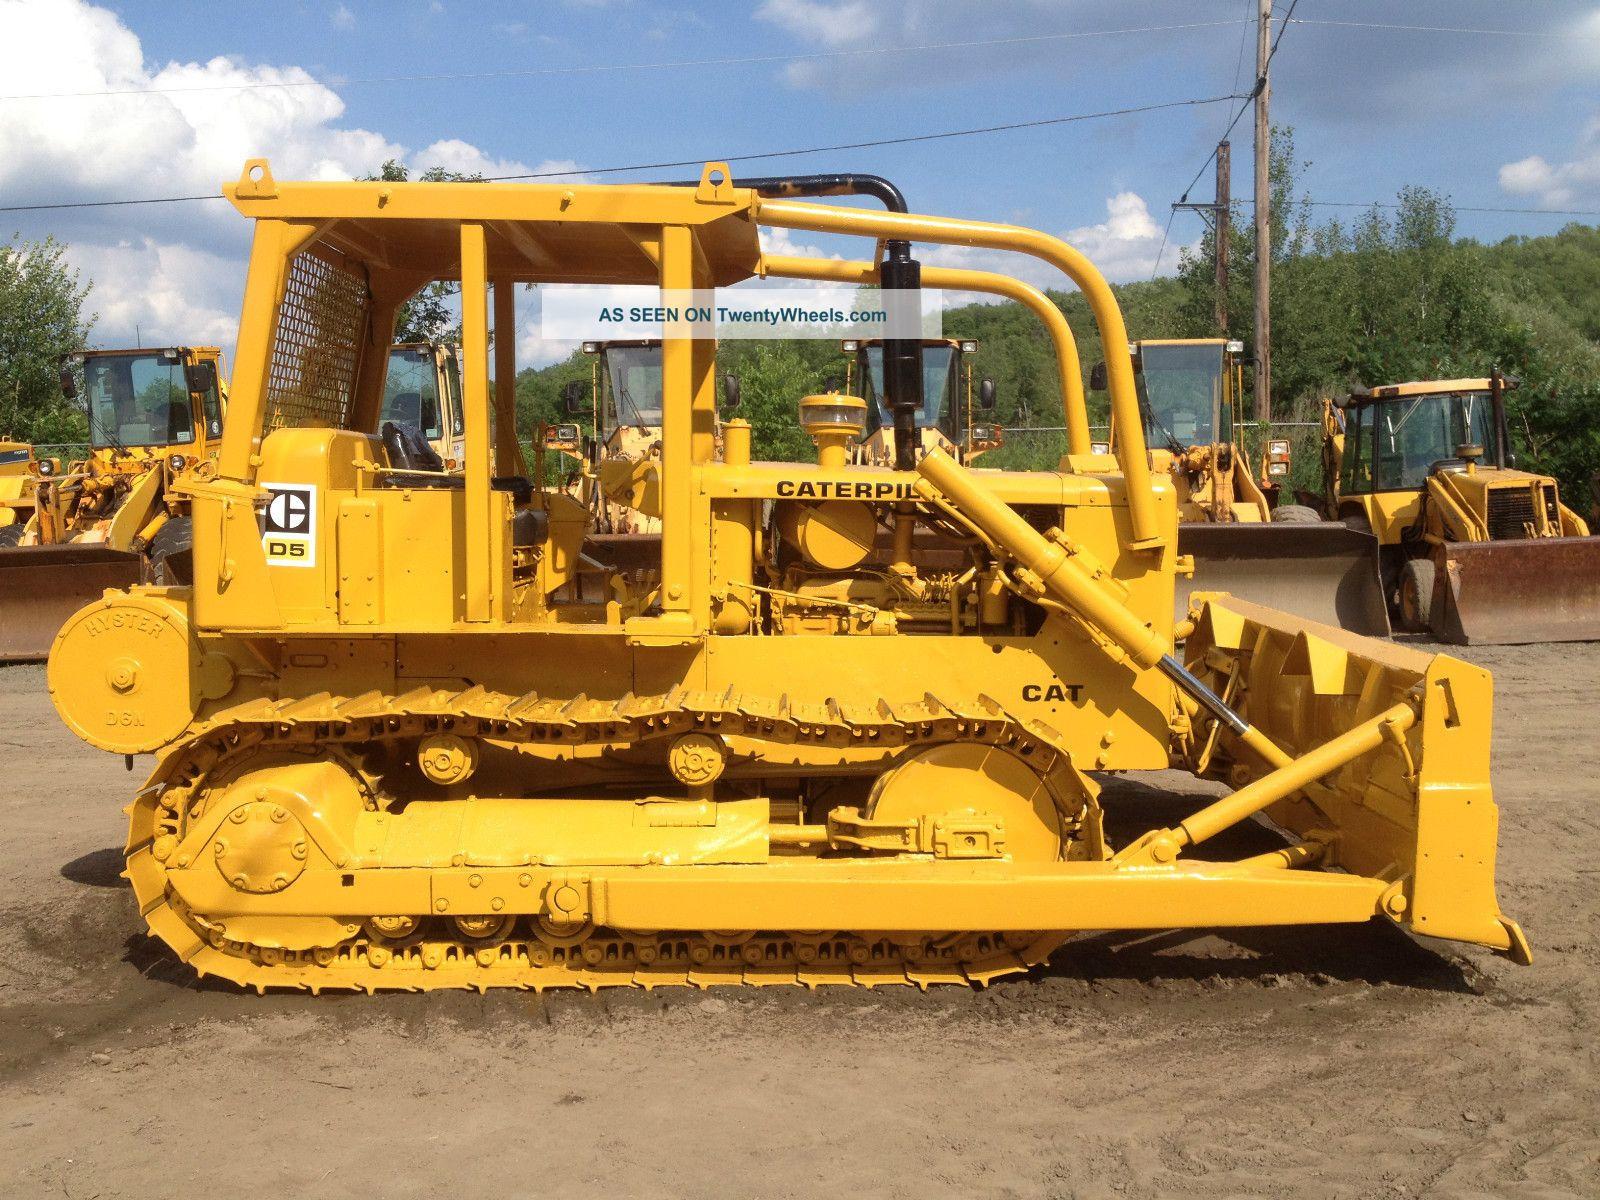 Caterpillar Cat D5 Crawler Loader Bulldozer Dozer Excavator